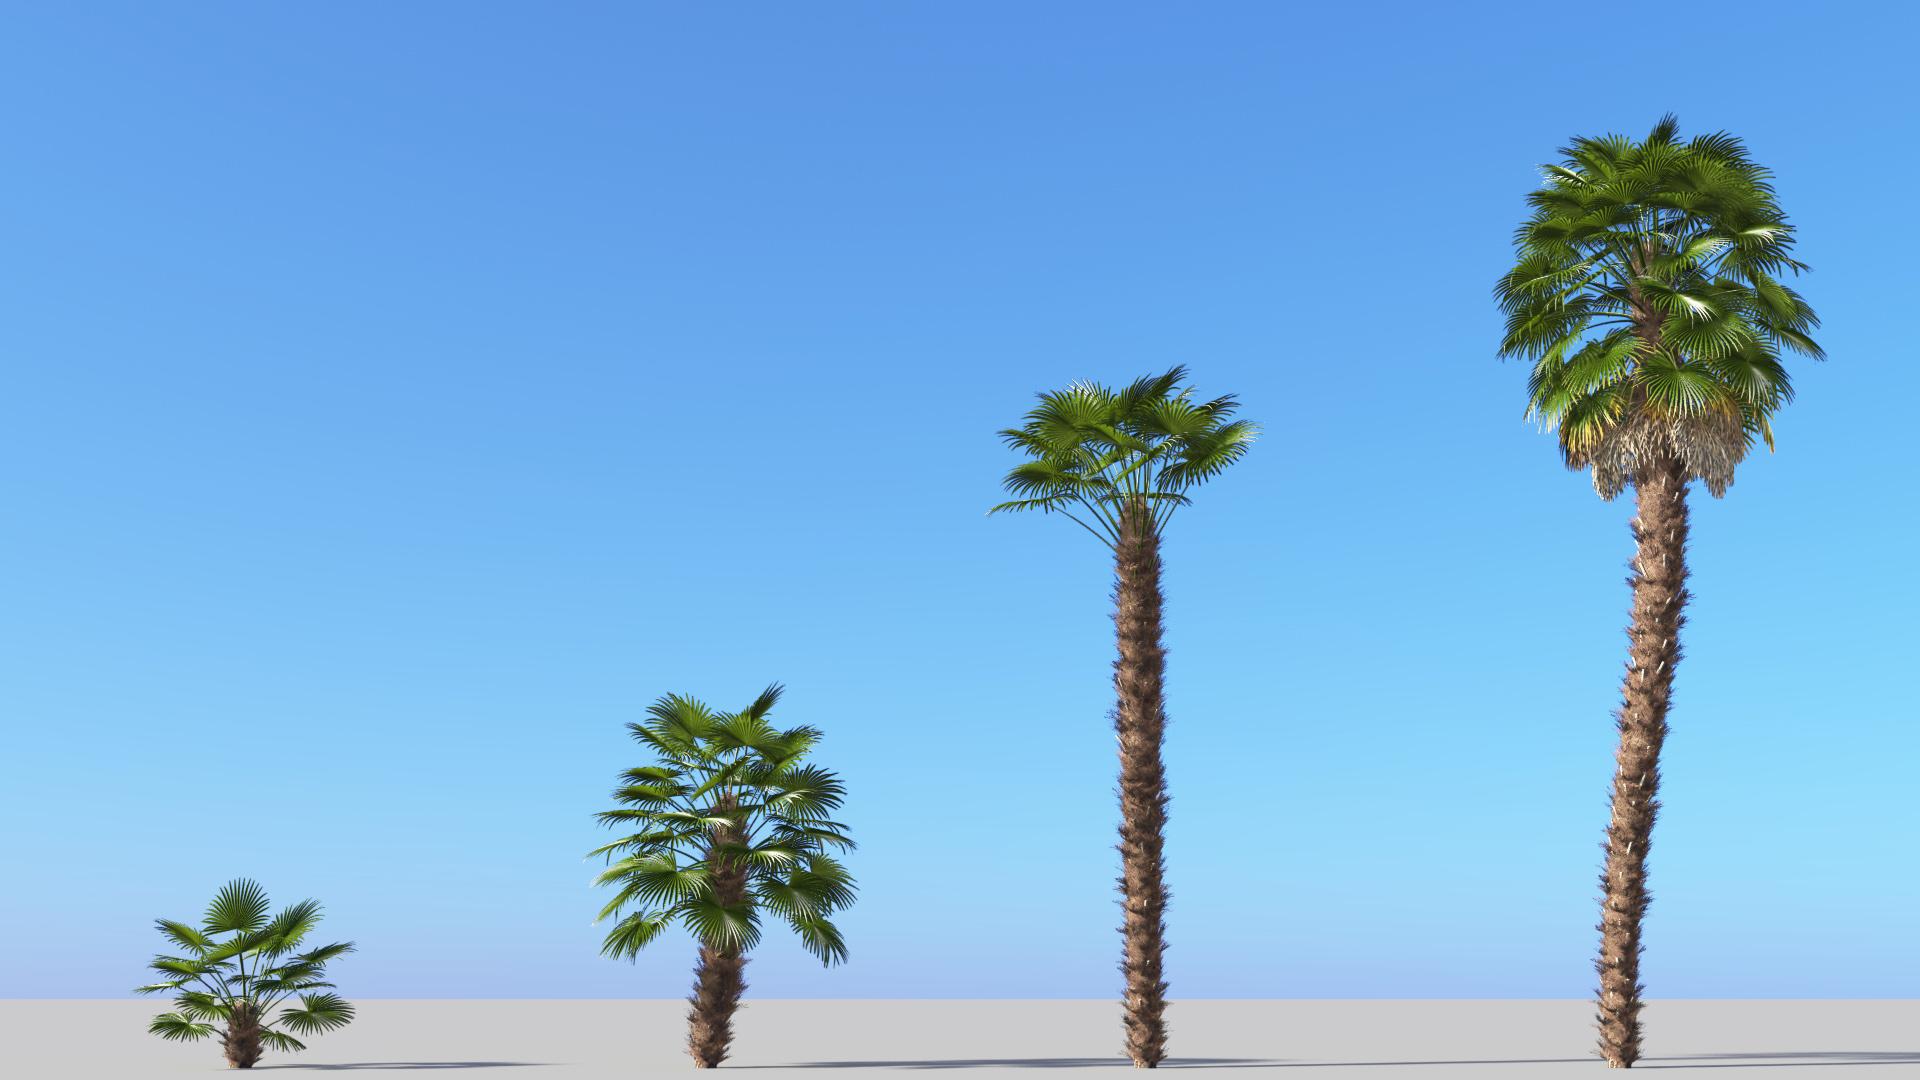 3D model of the Windmill palm Trachycarpus fortunei